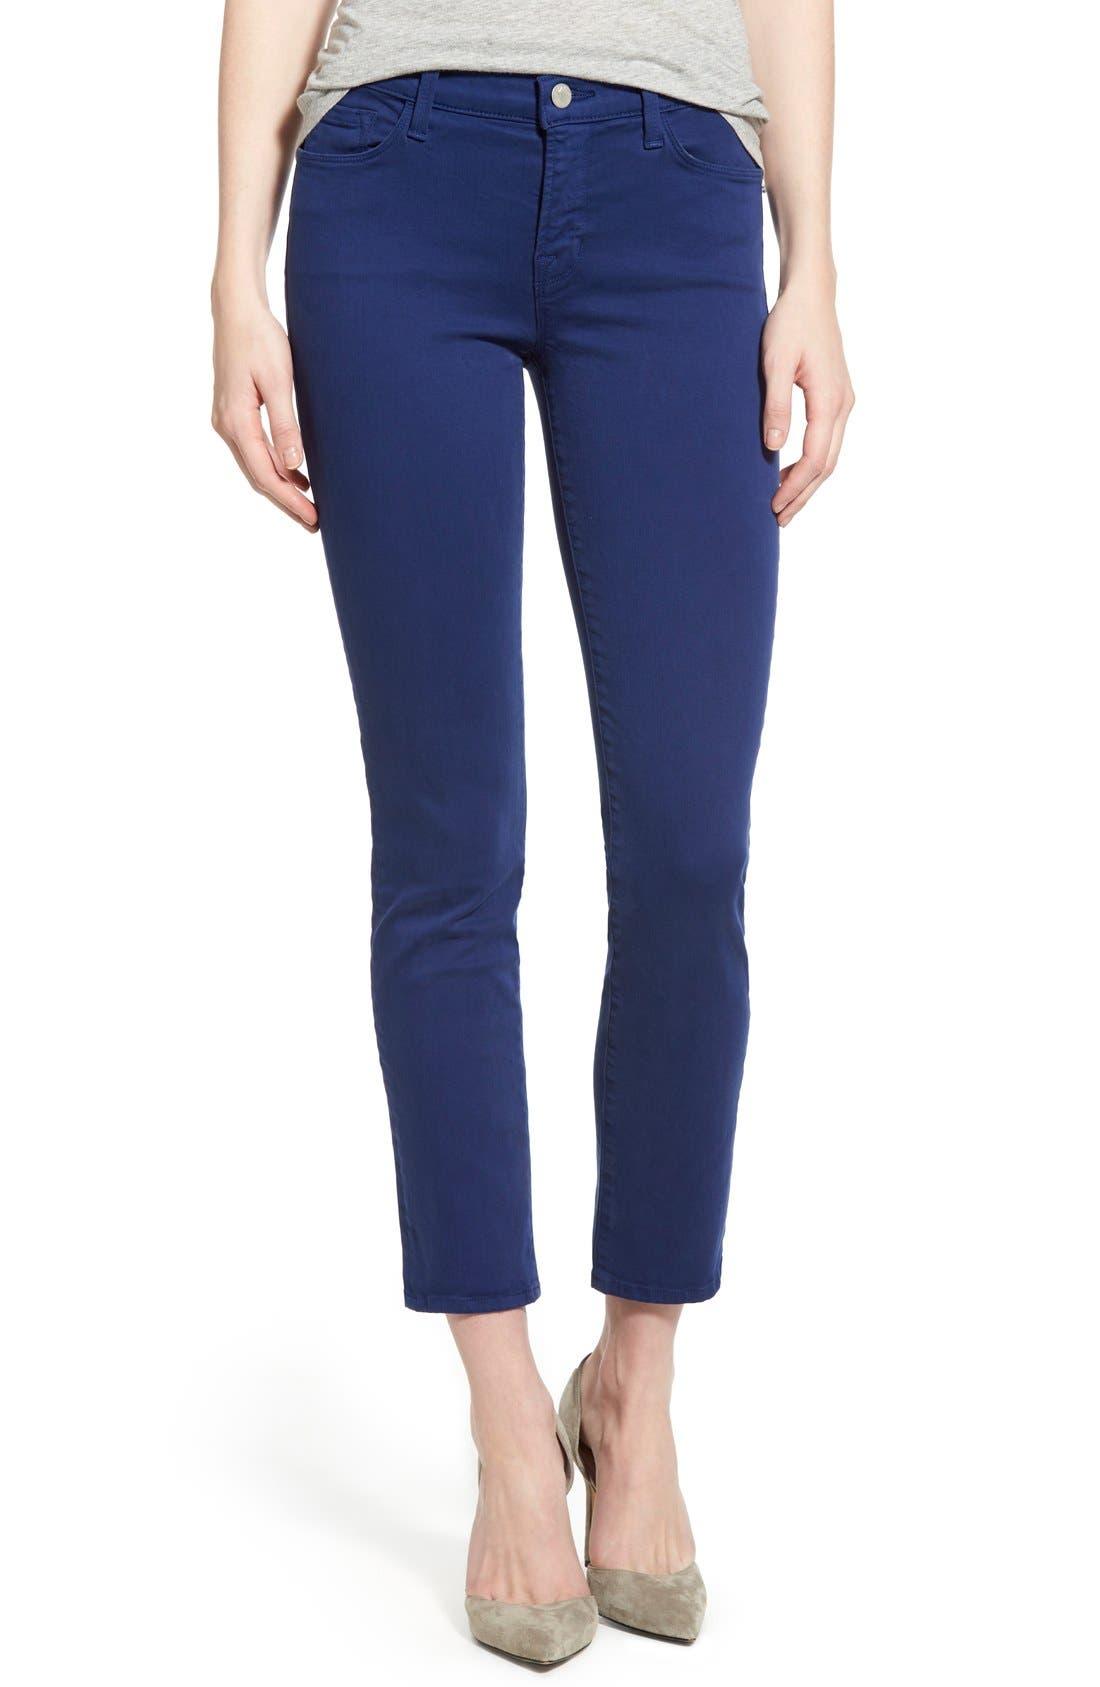 Main Image - J Brand 'Rail' Mid Rise Super Skinny Jeans